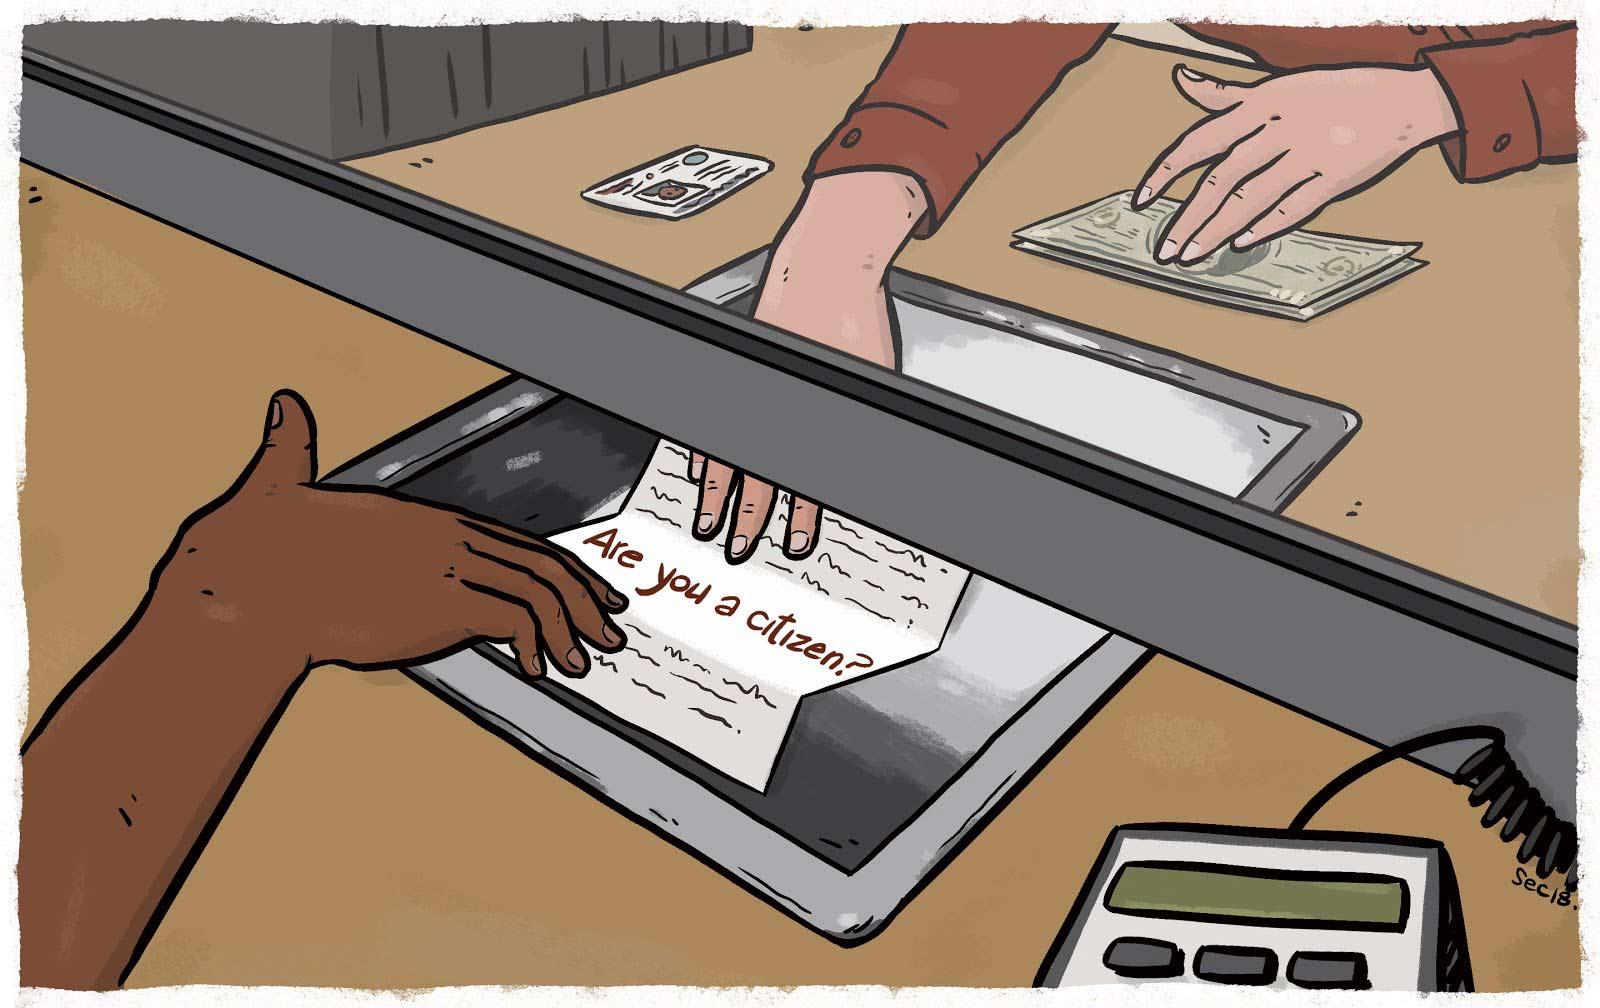 UnAmerican Banking